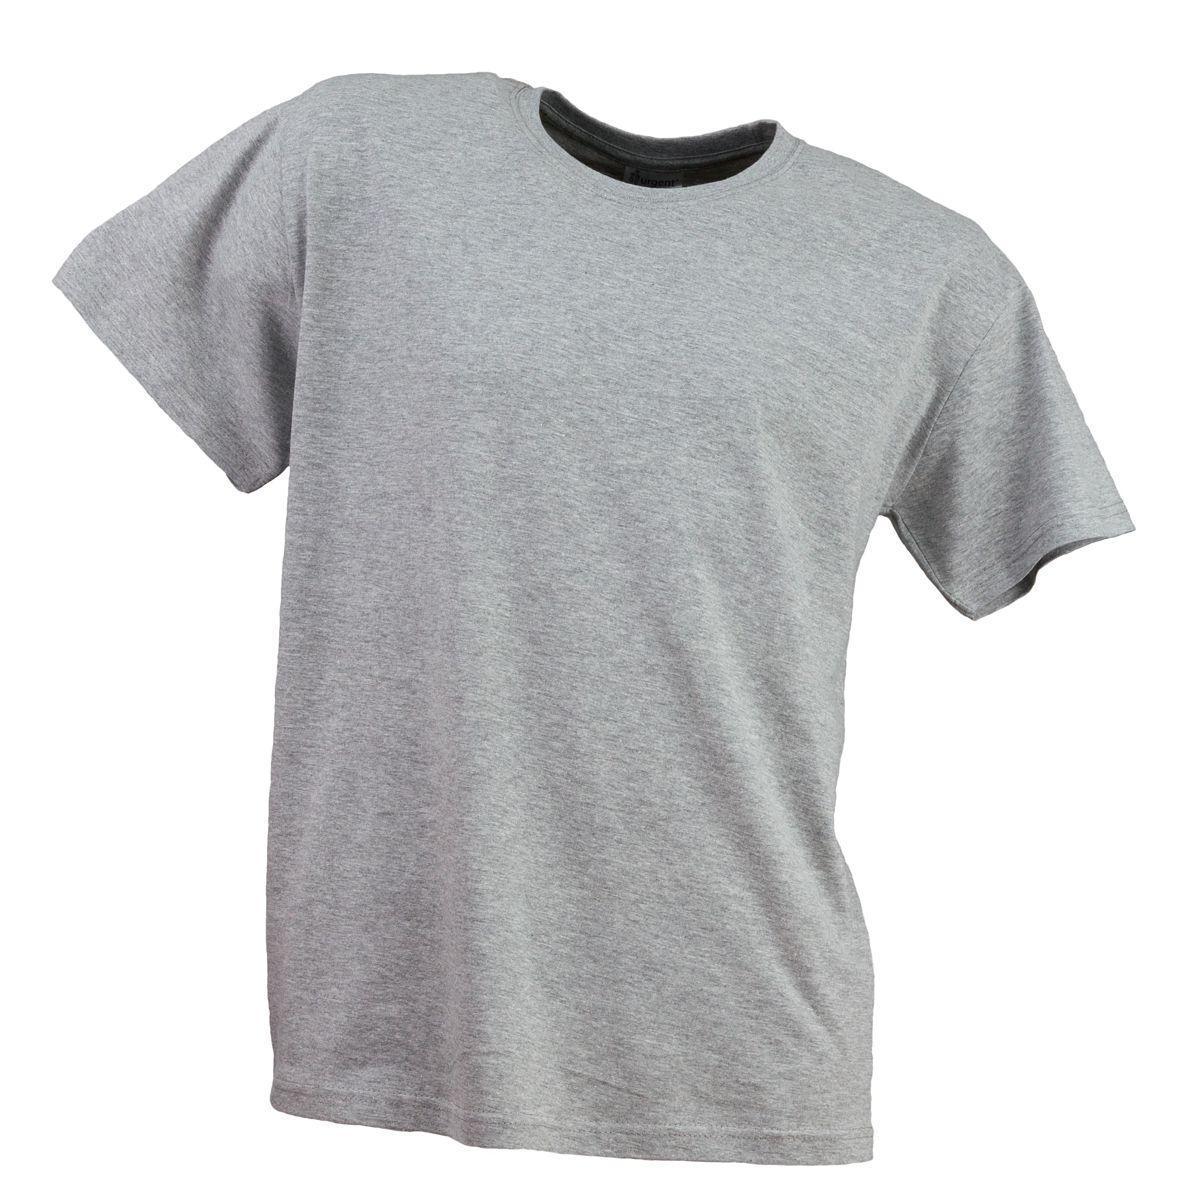 Футболка T-SHIRT MĘSKI POMARAŃCZ 180g плотностью 180g, серого цвета.  Urgent (POLAND) XXL